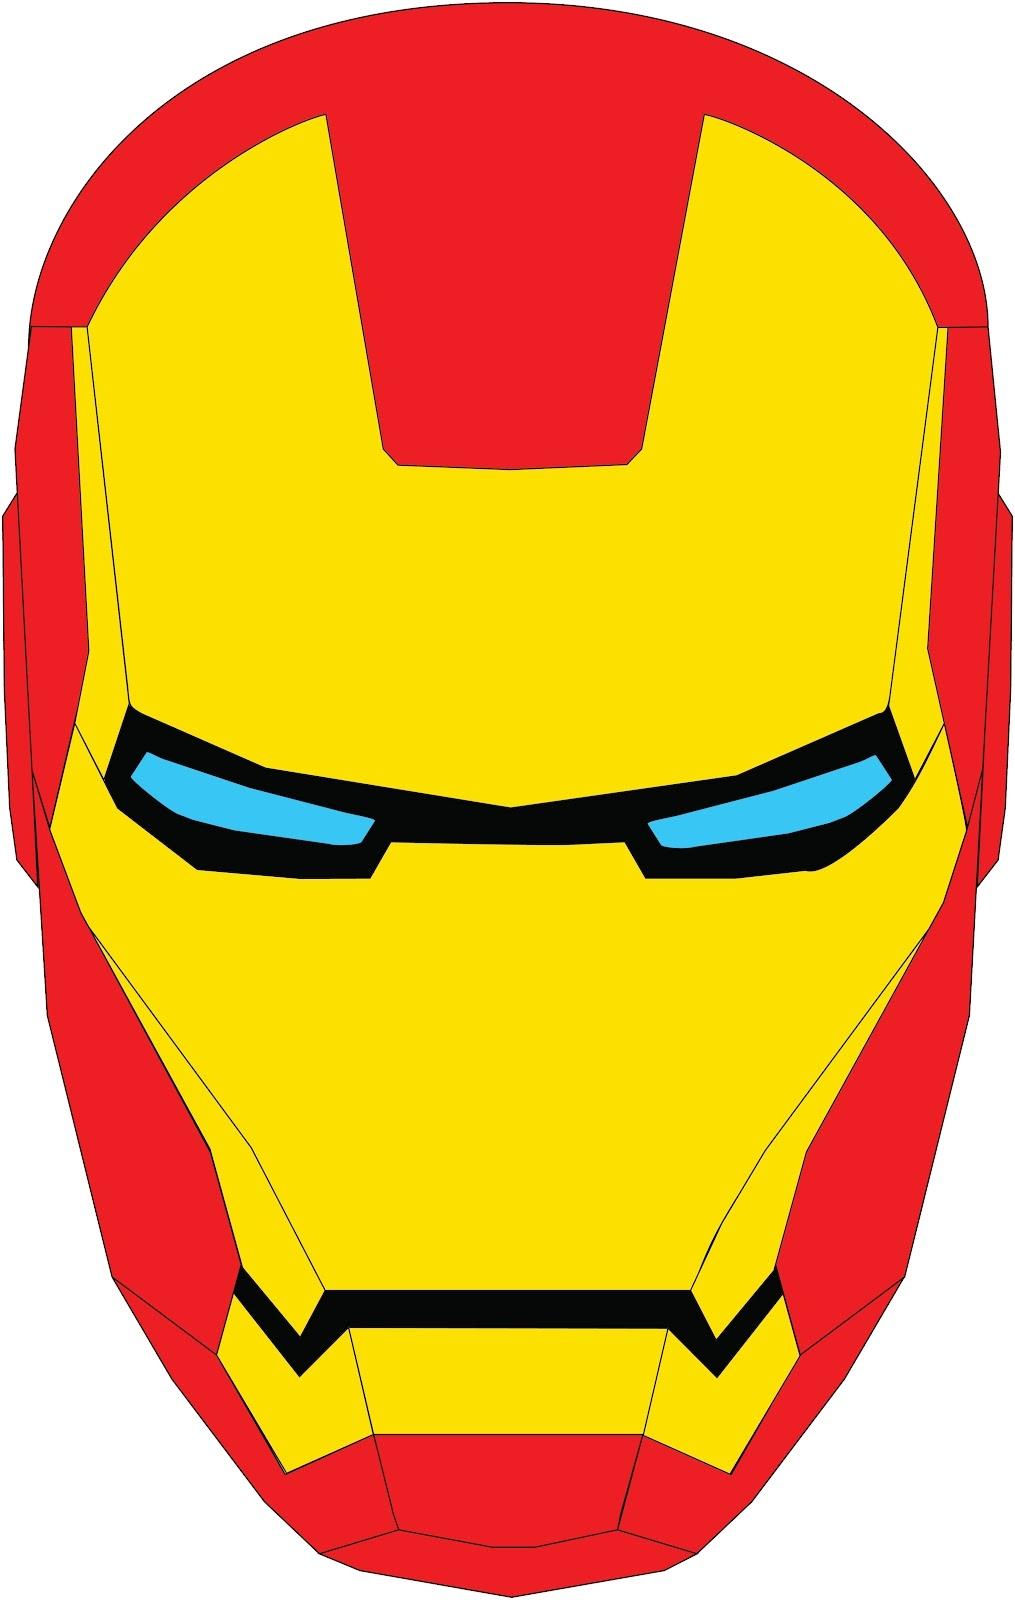 Iron Man Mask Logo Clipart